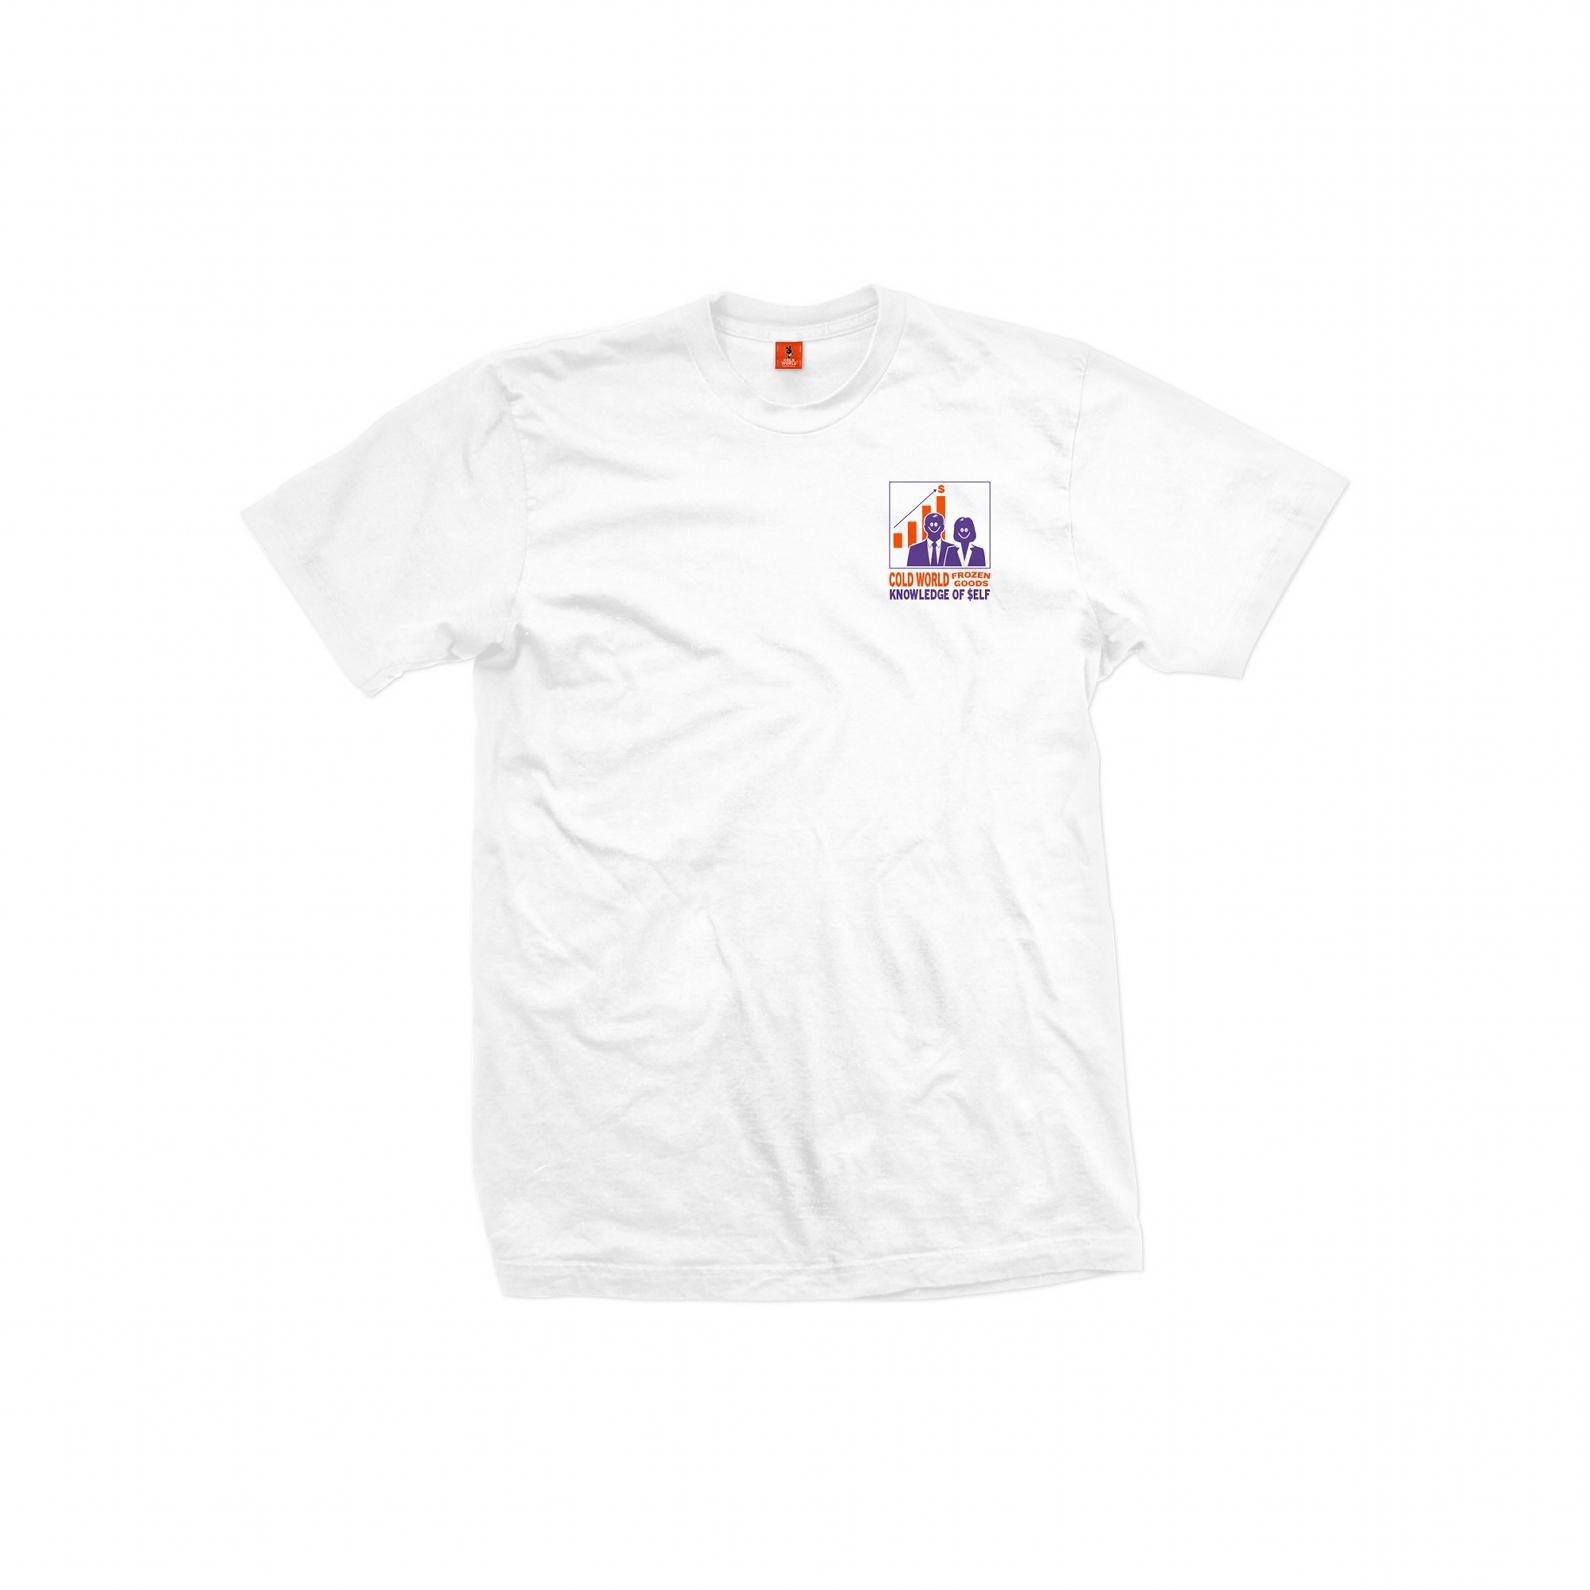 【COLD WORLD FROZEN GOODS/コールドワールドフローズングッズ】INVESTMENT T-SHIRT Tシャツ / WHITE